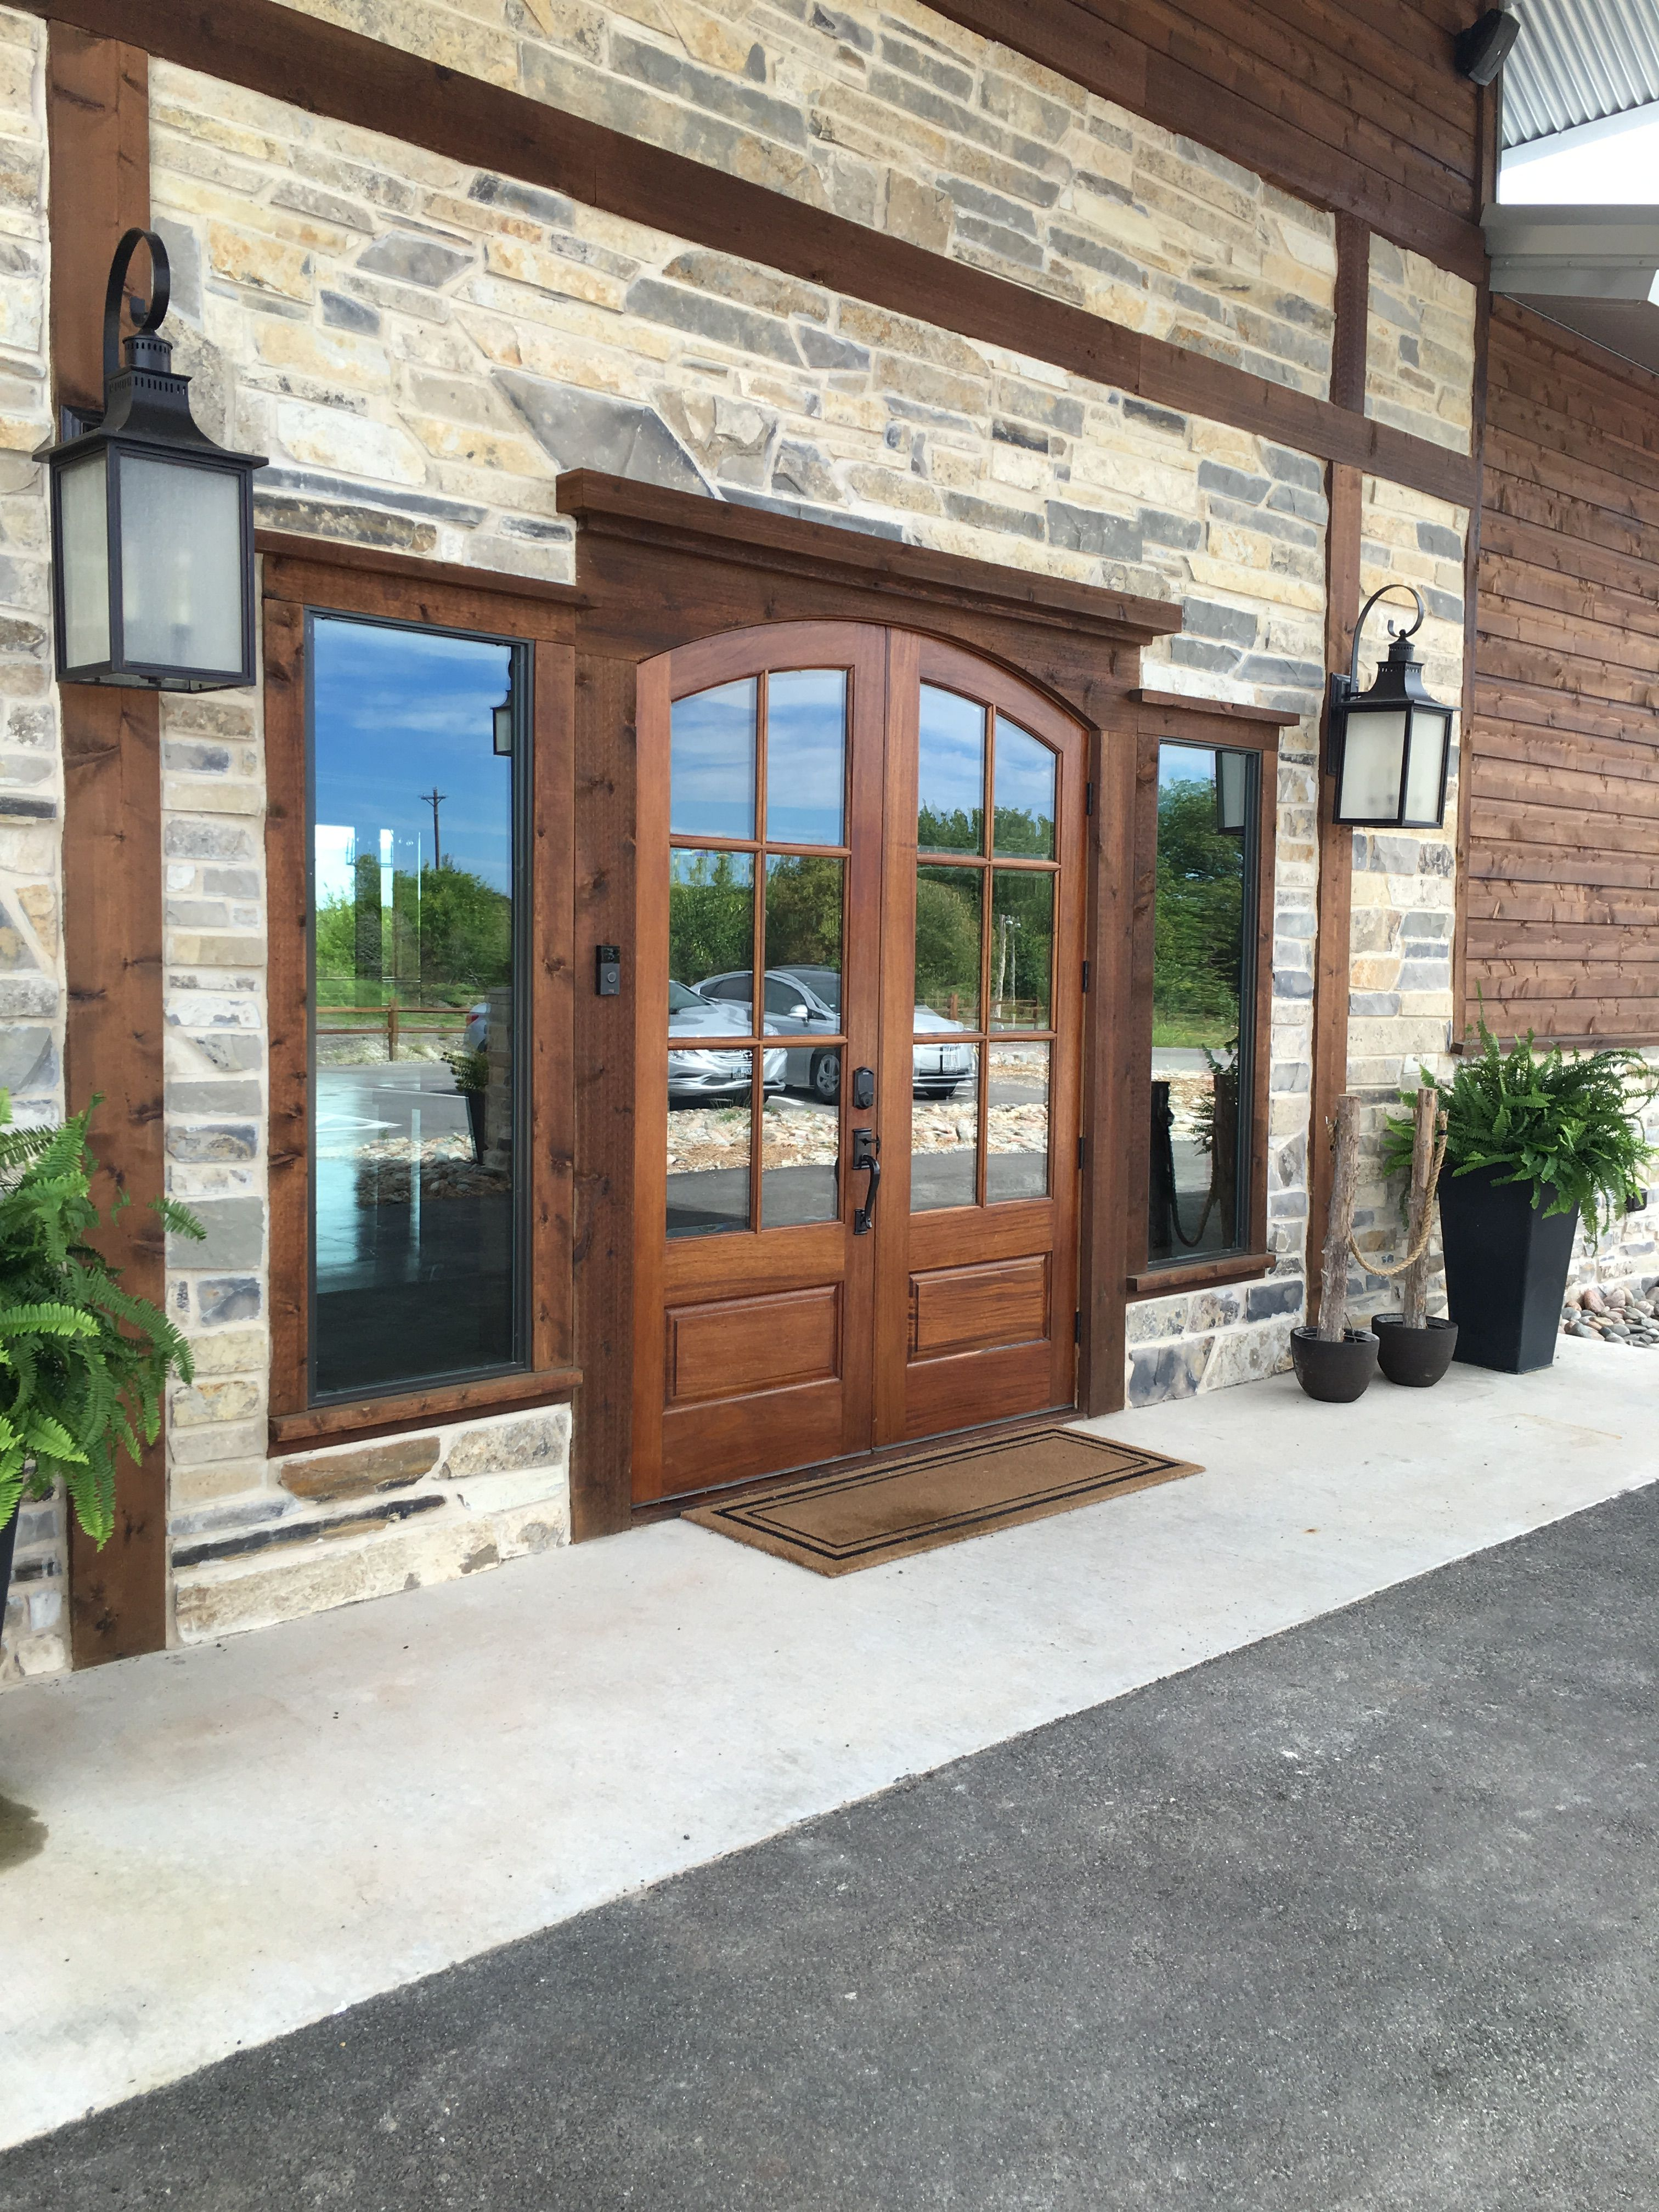 Stone Crest Venue in McKinney Texas Rustic